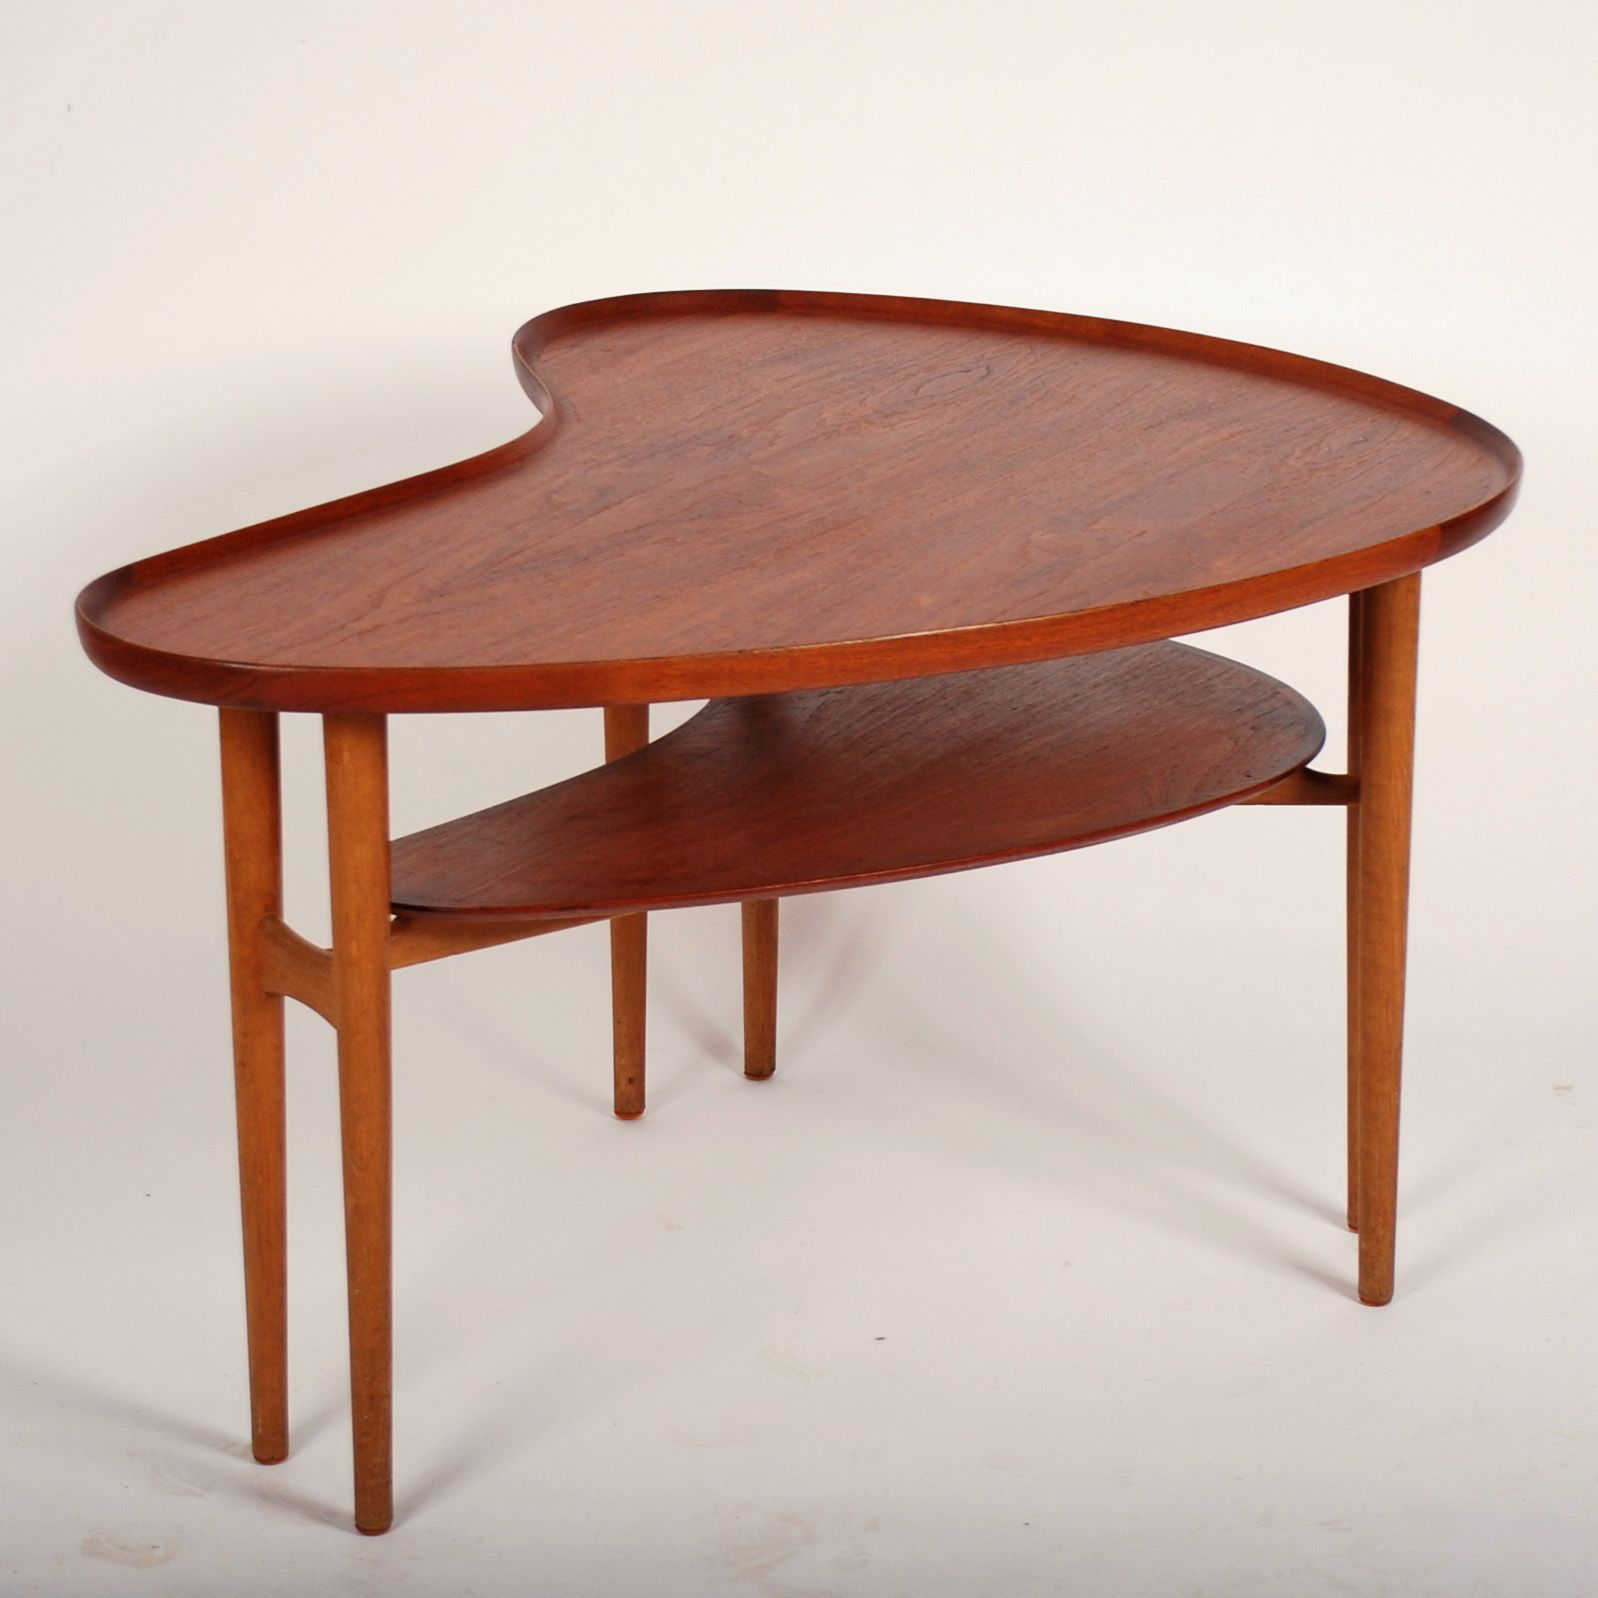 Arne Vodder Coffeetable